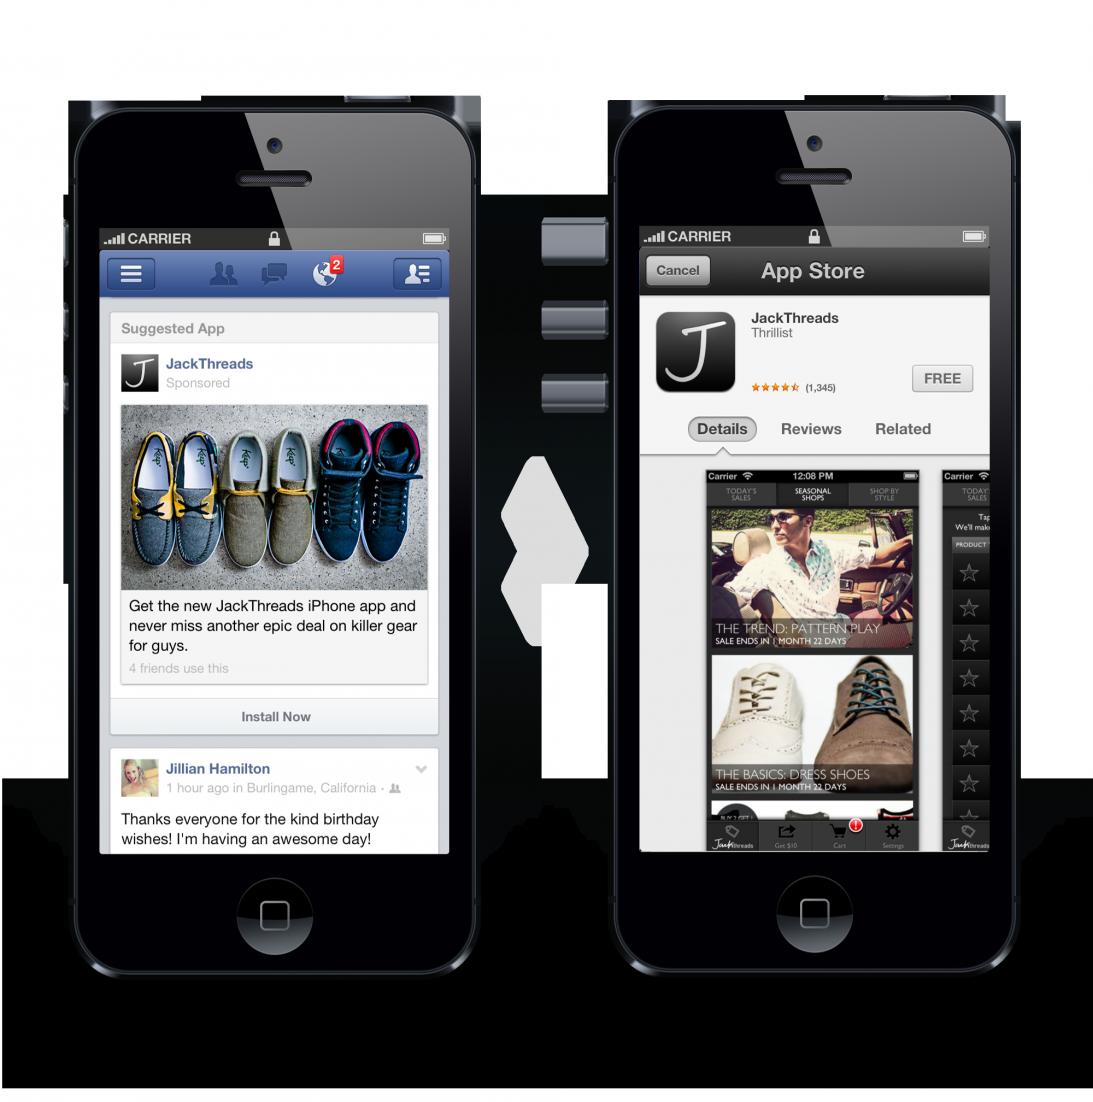 Mobile App Install Ads